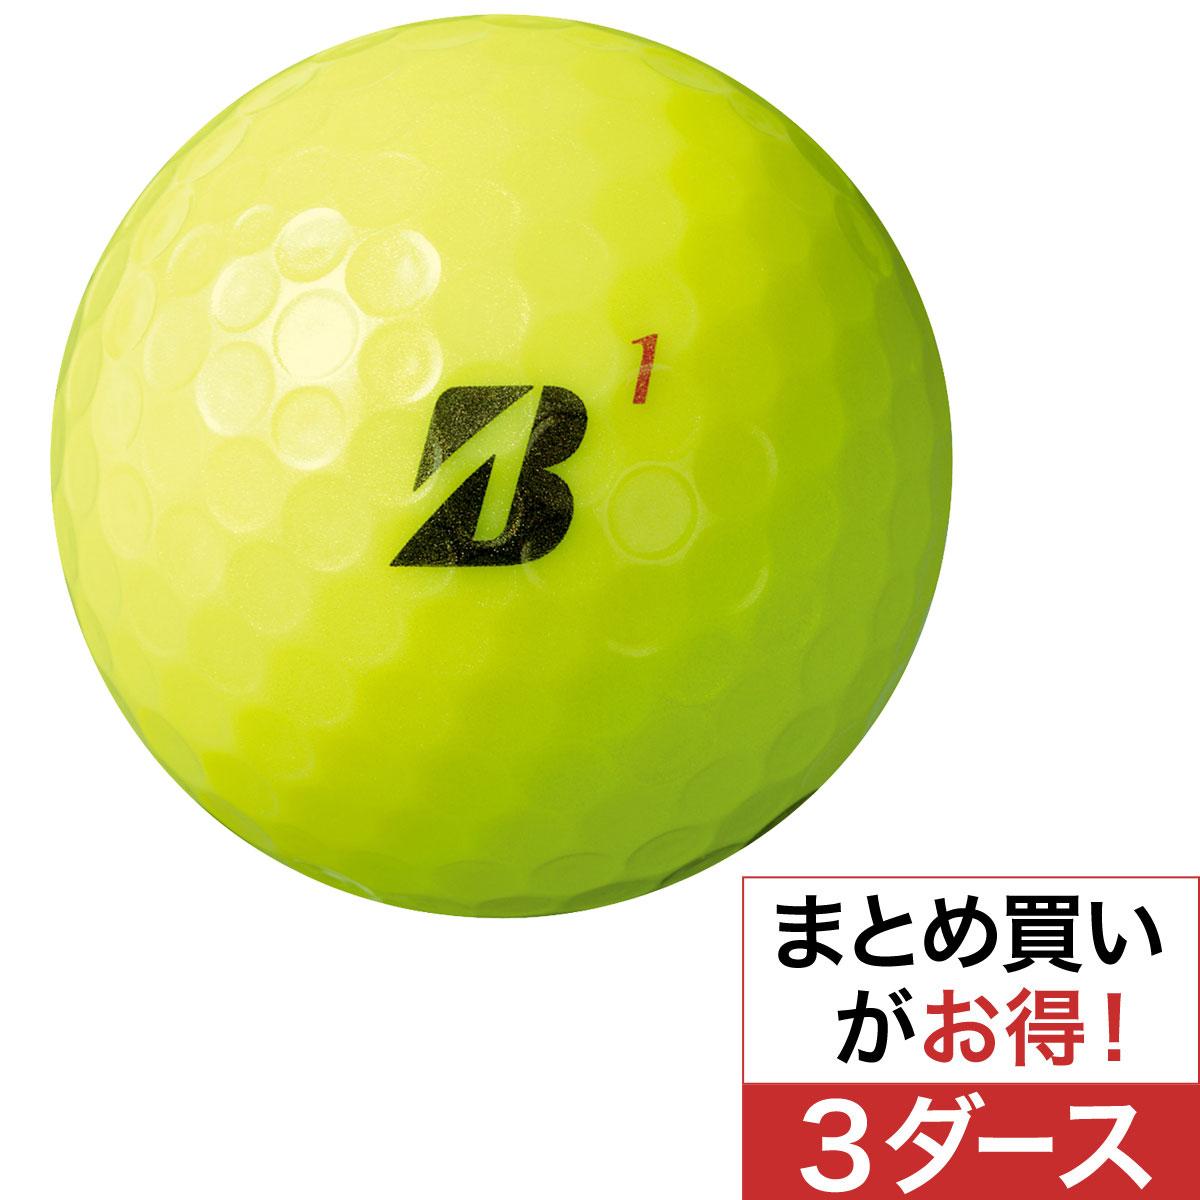 TOUR B X ボール 3ダースセット【オンネームサービス有り】(文字色:黒のみ)【2020年2月21日発売予定】